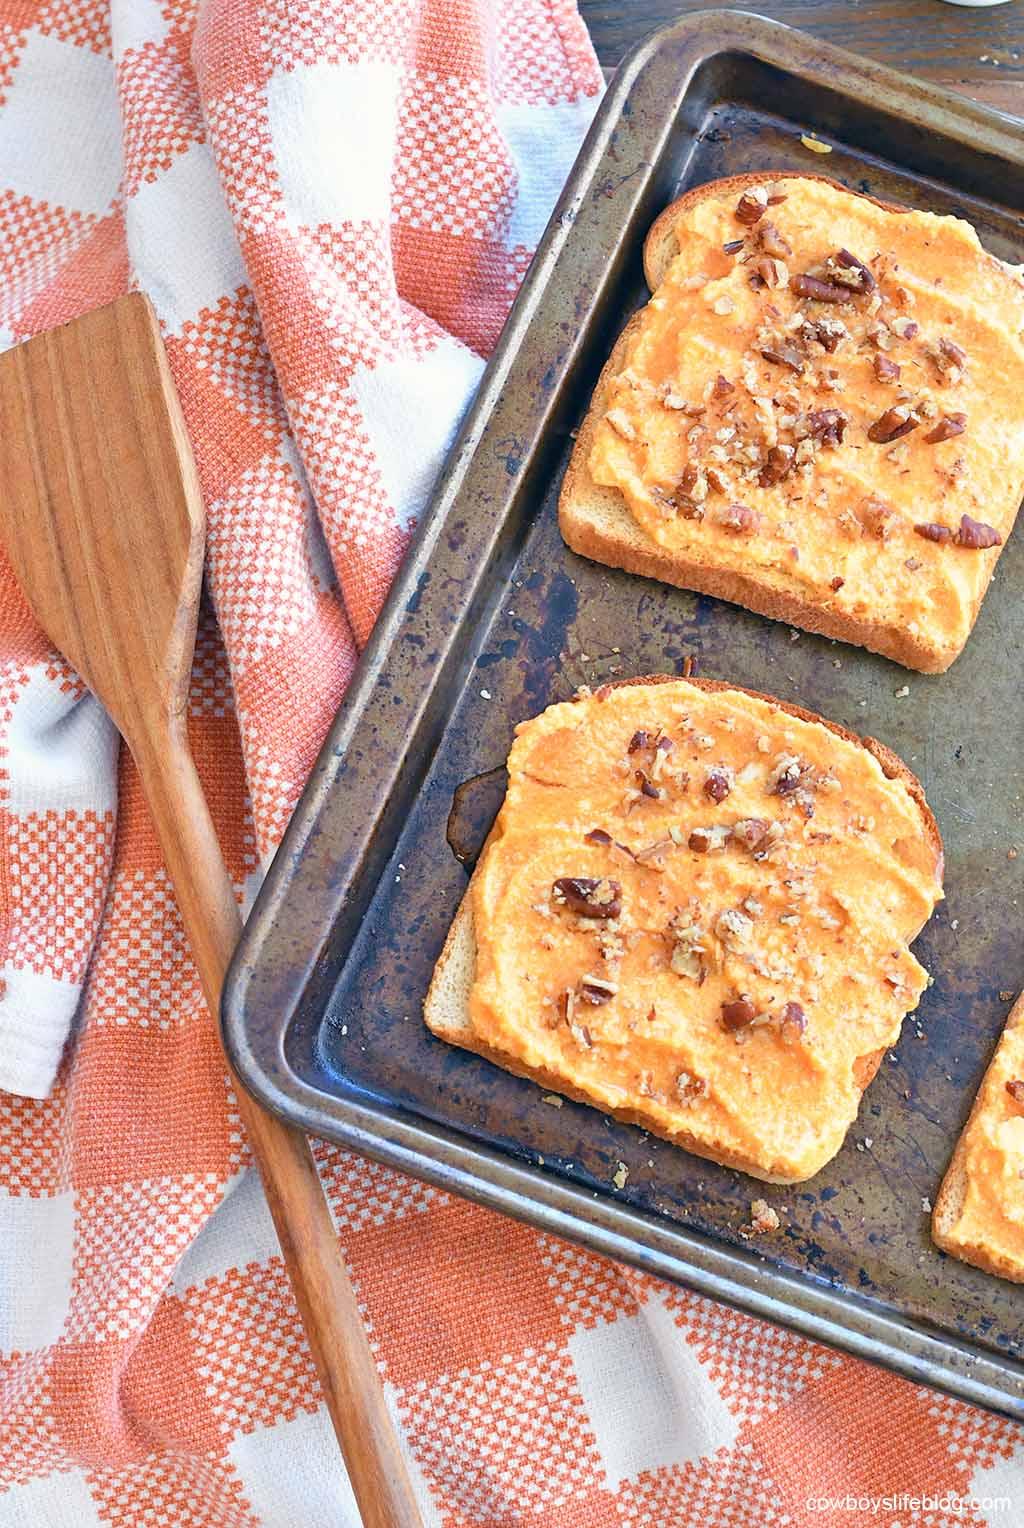 How to make pumpkin ricotta toast